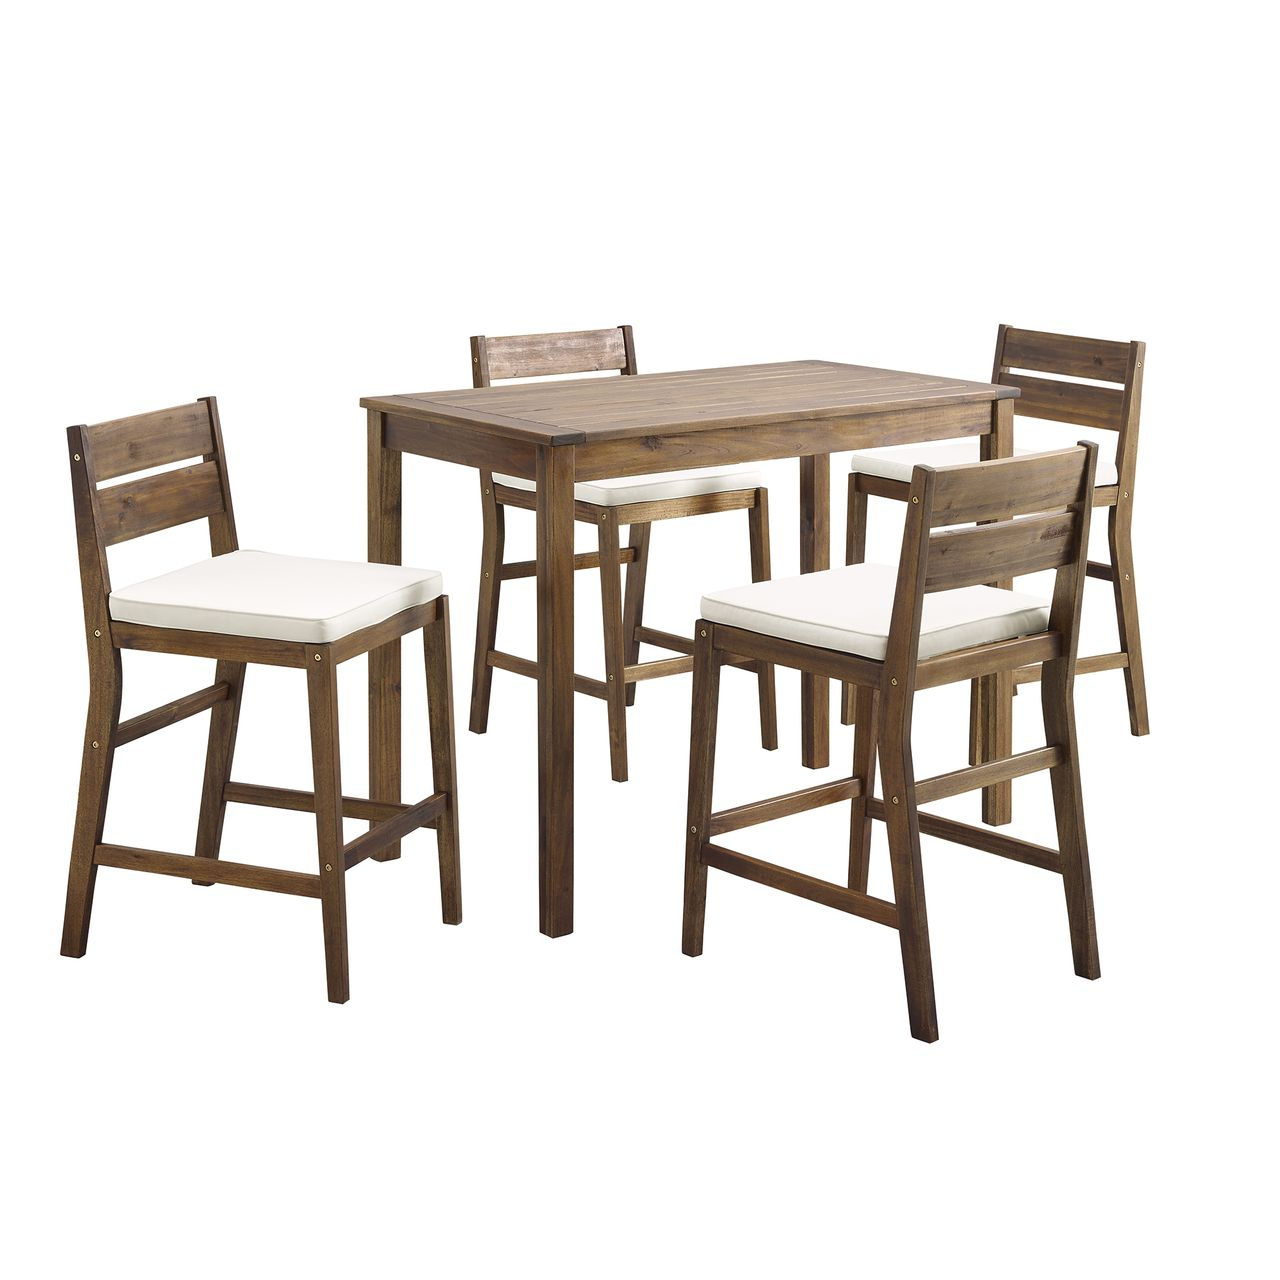 Walker Edison 5-Piece Acacia Counter Height Dining Group - Dark Brown